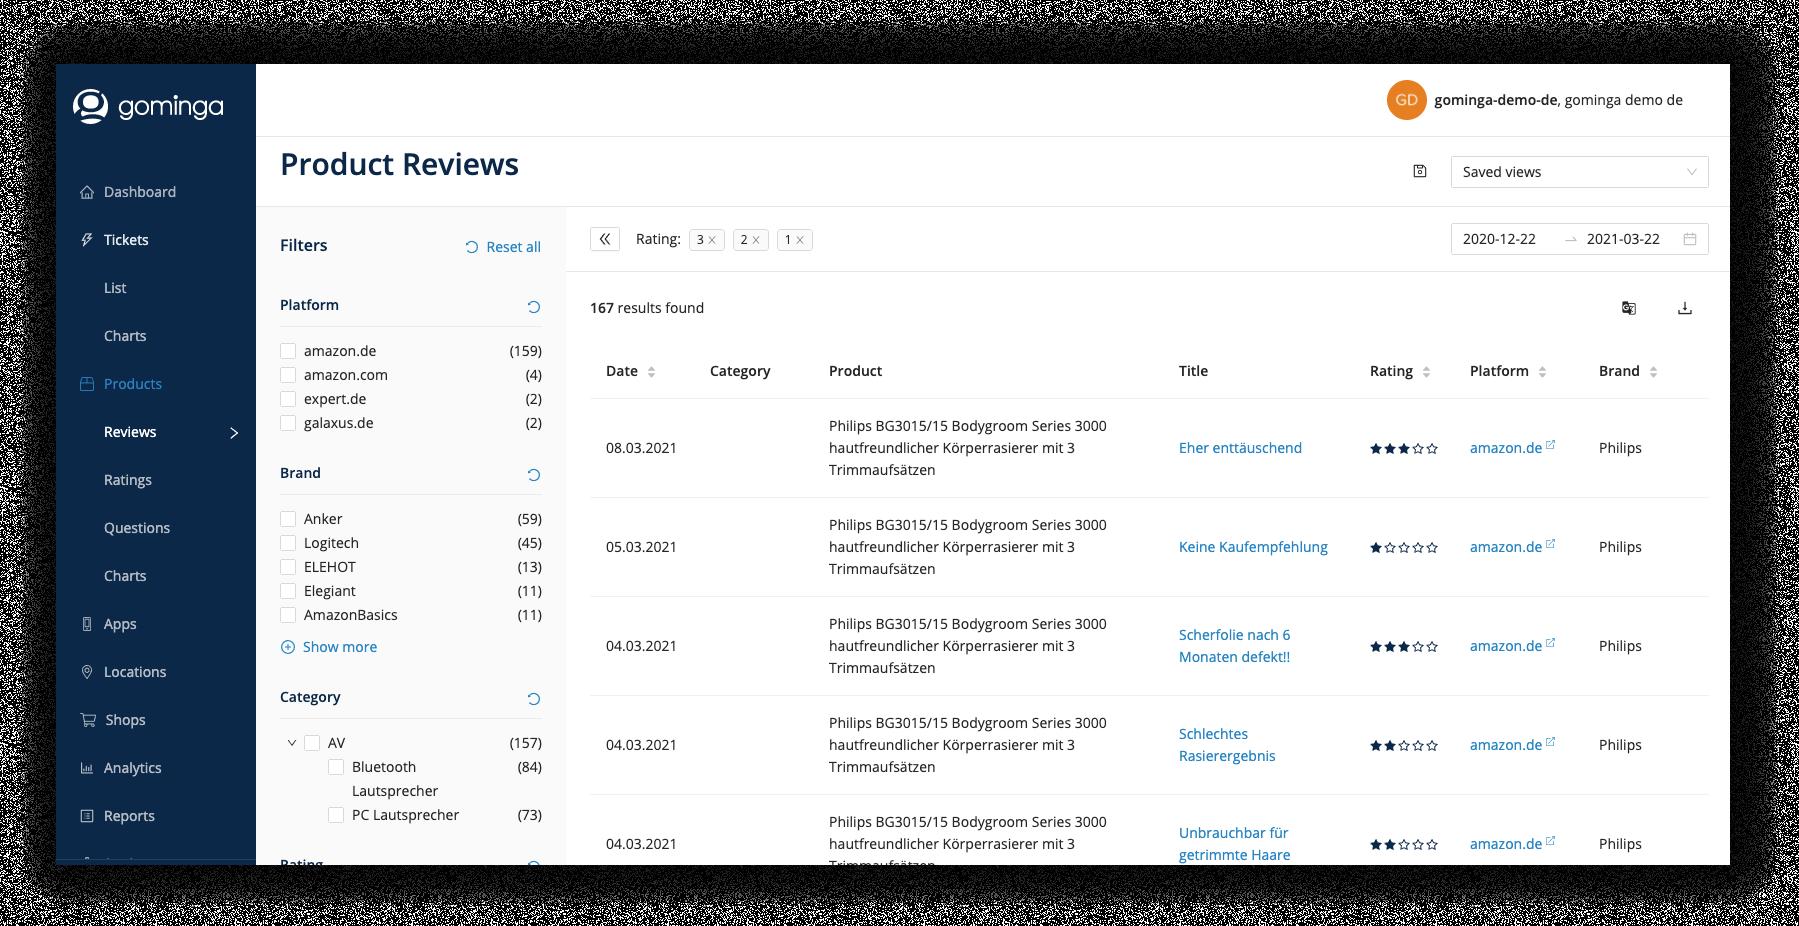 gominga-tool-dashboard-screenshot